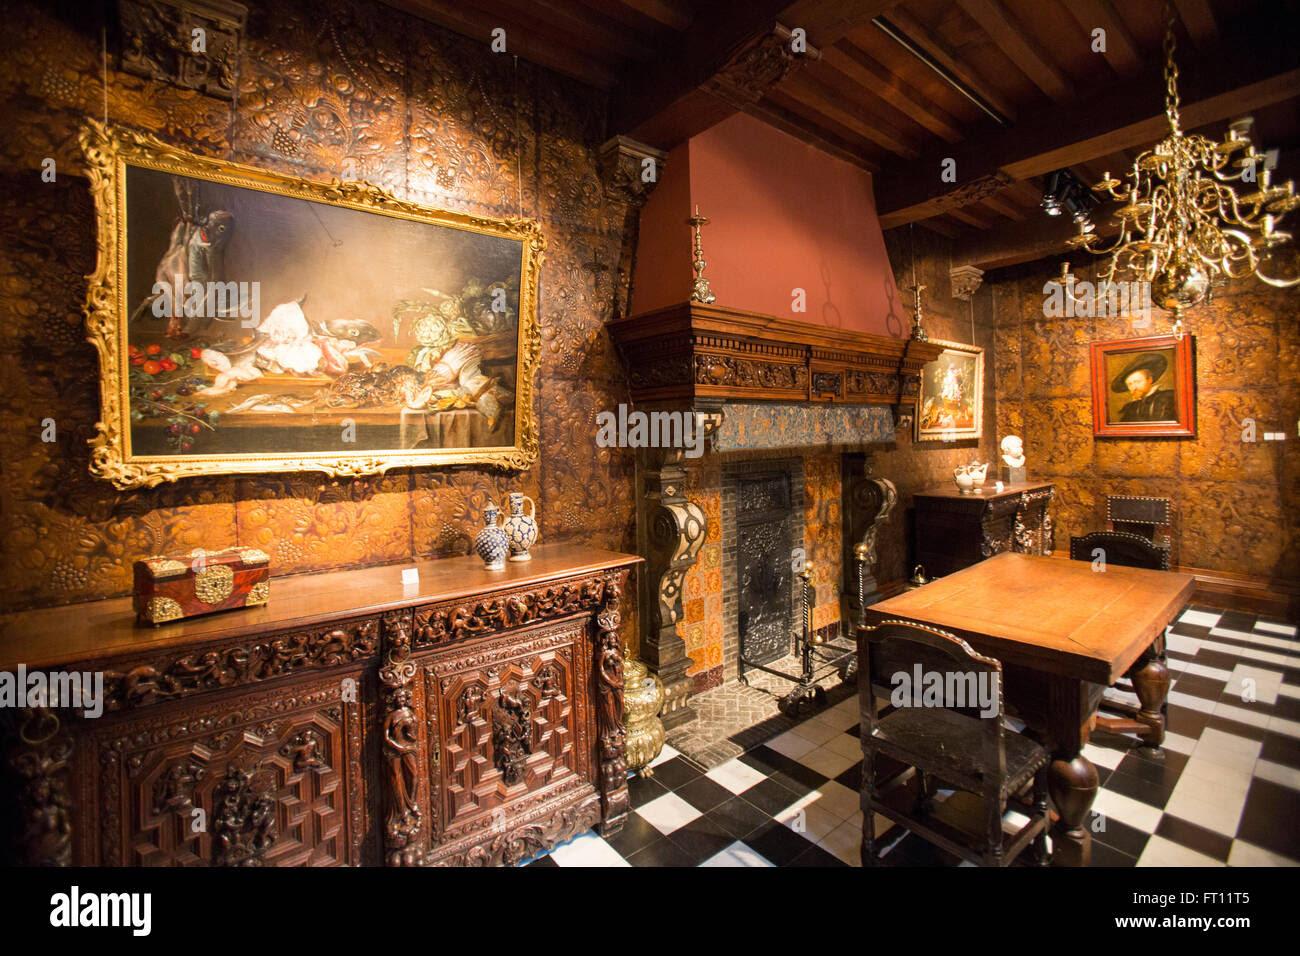 At Home in Chicago : Schweikher-Langsdorf Home & Studio